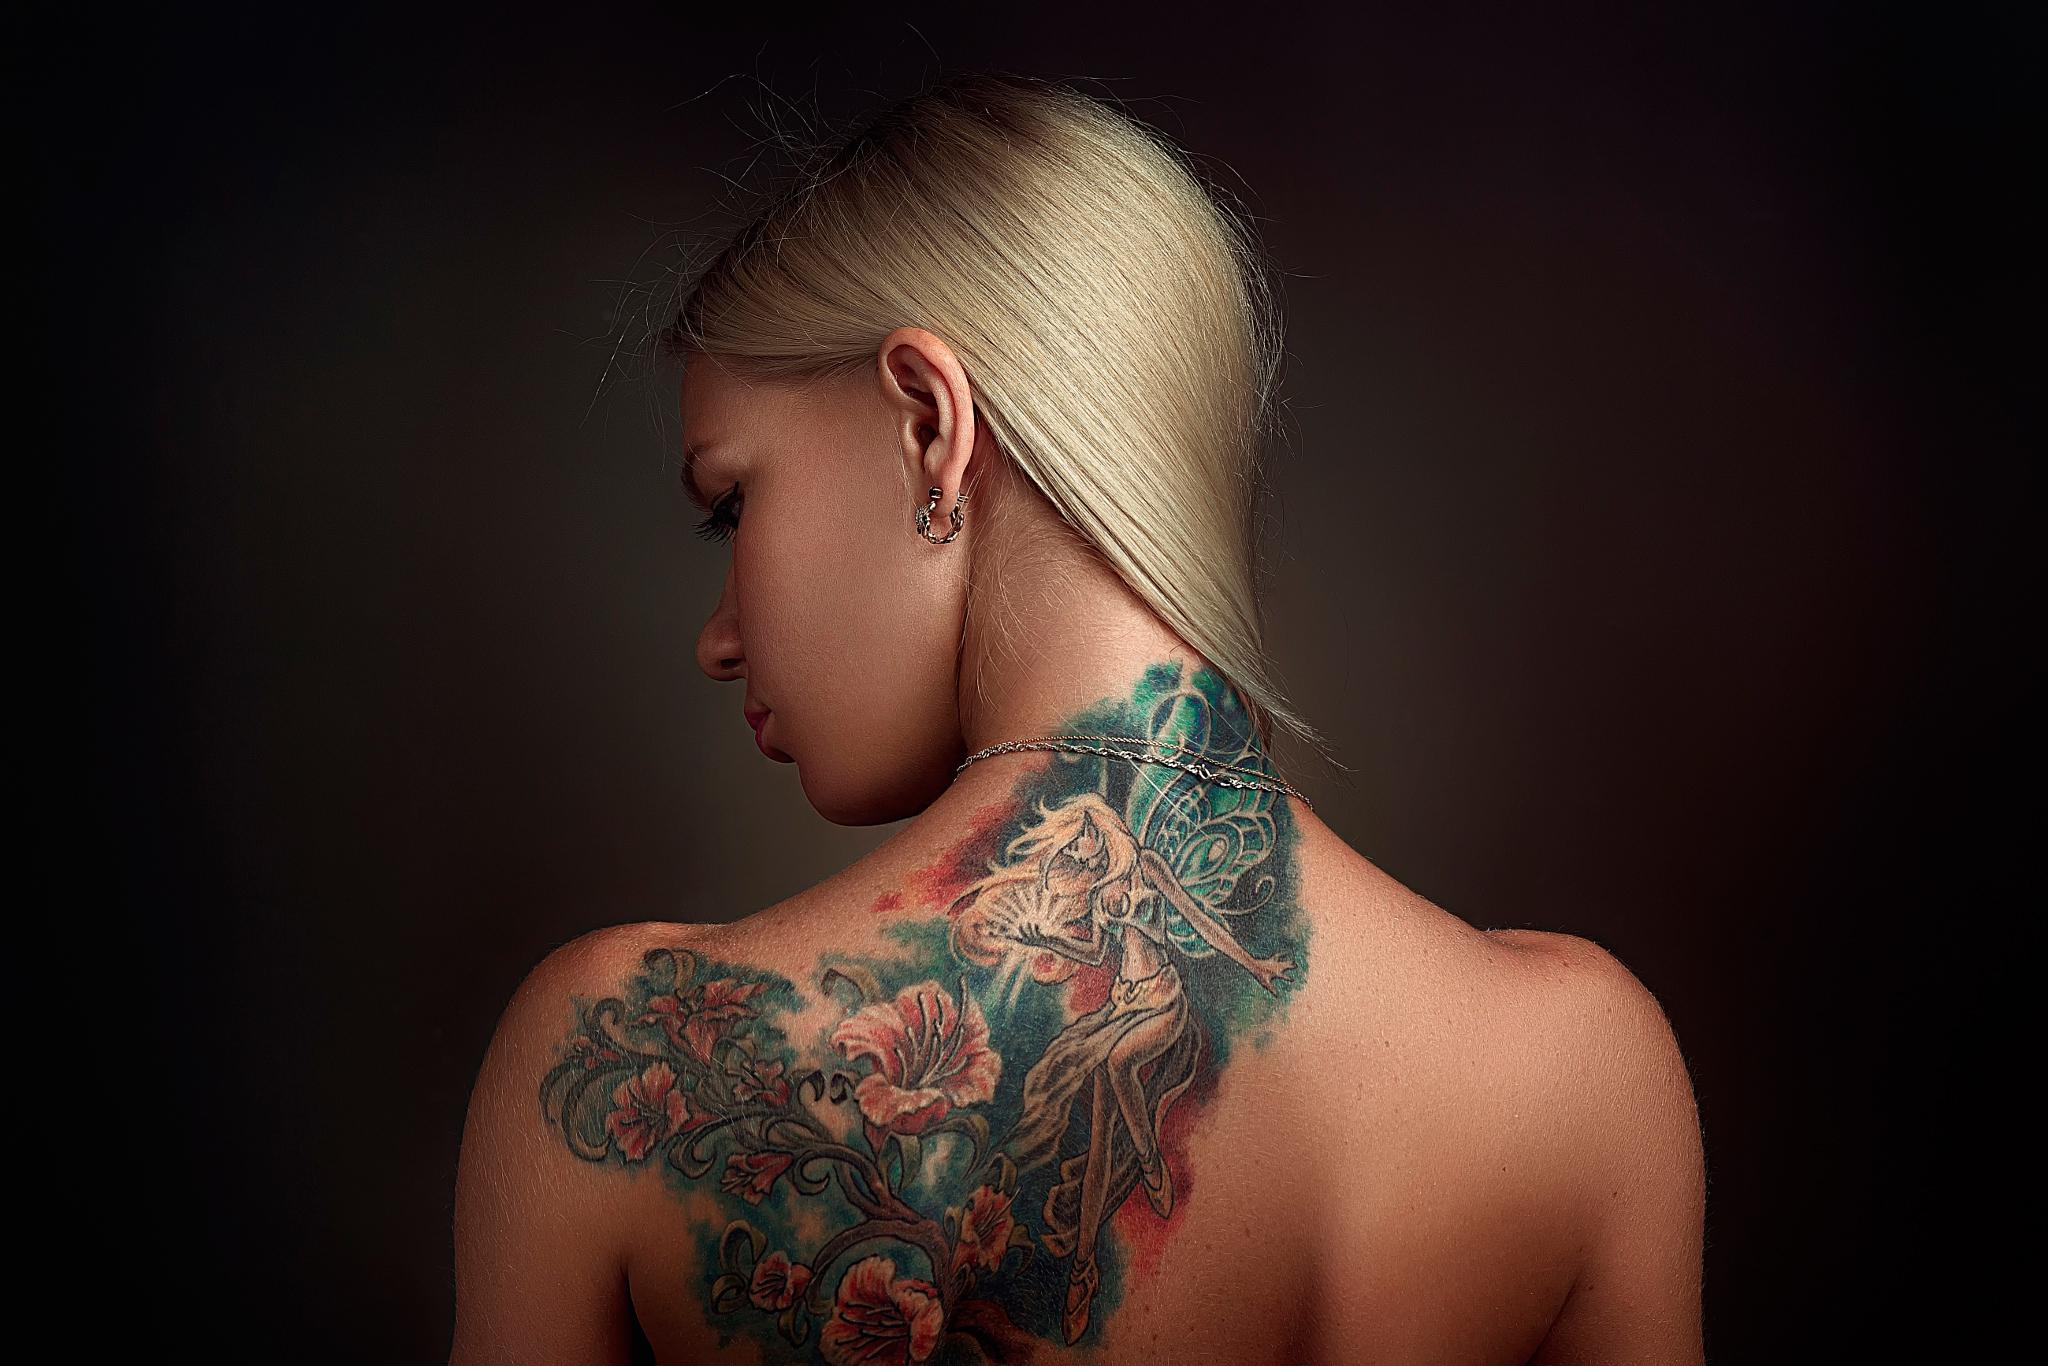 Картинки татуировок у девушек